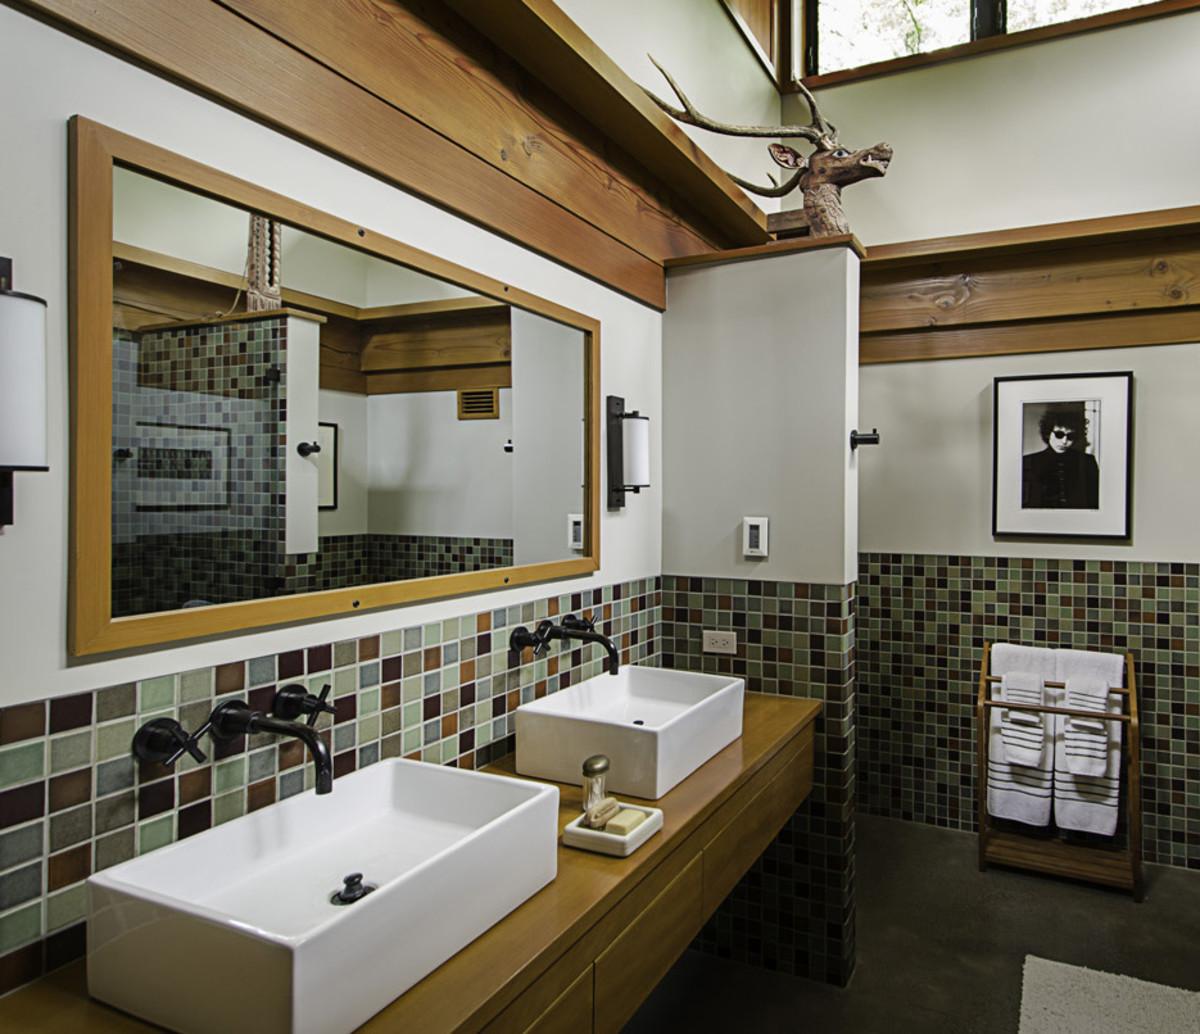 earth-tone bathroom